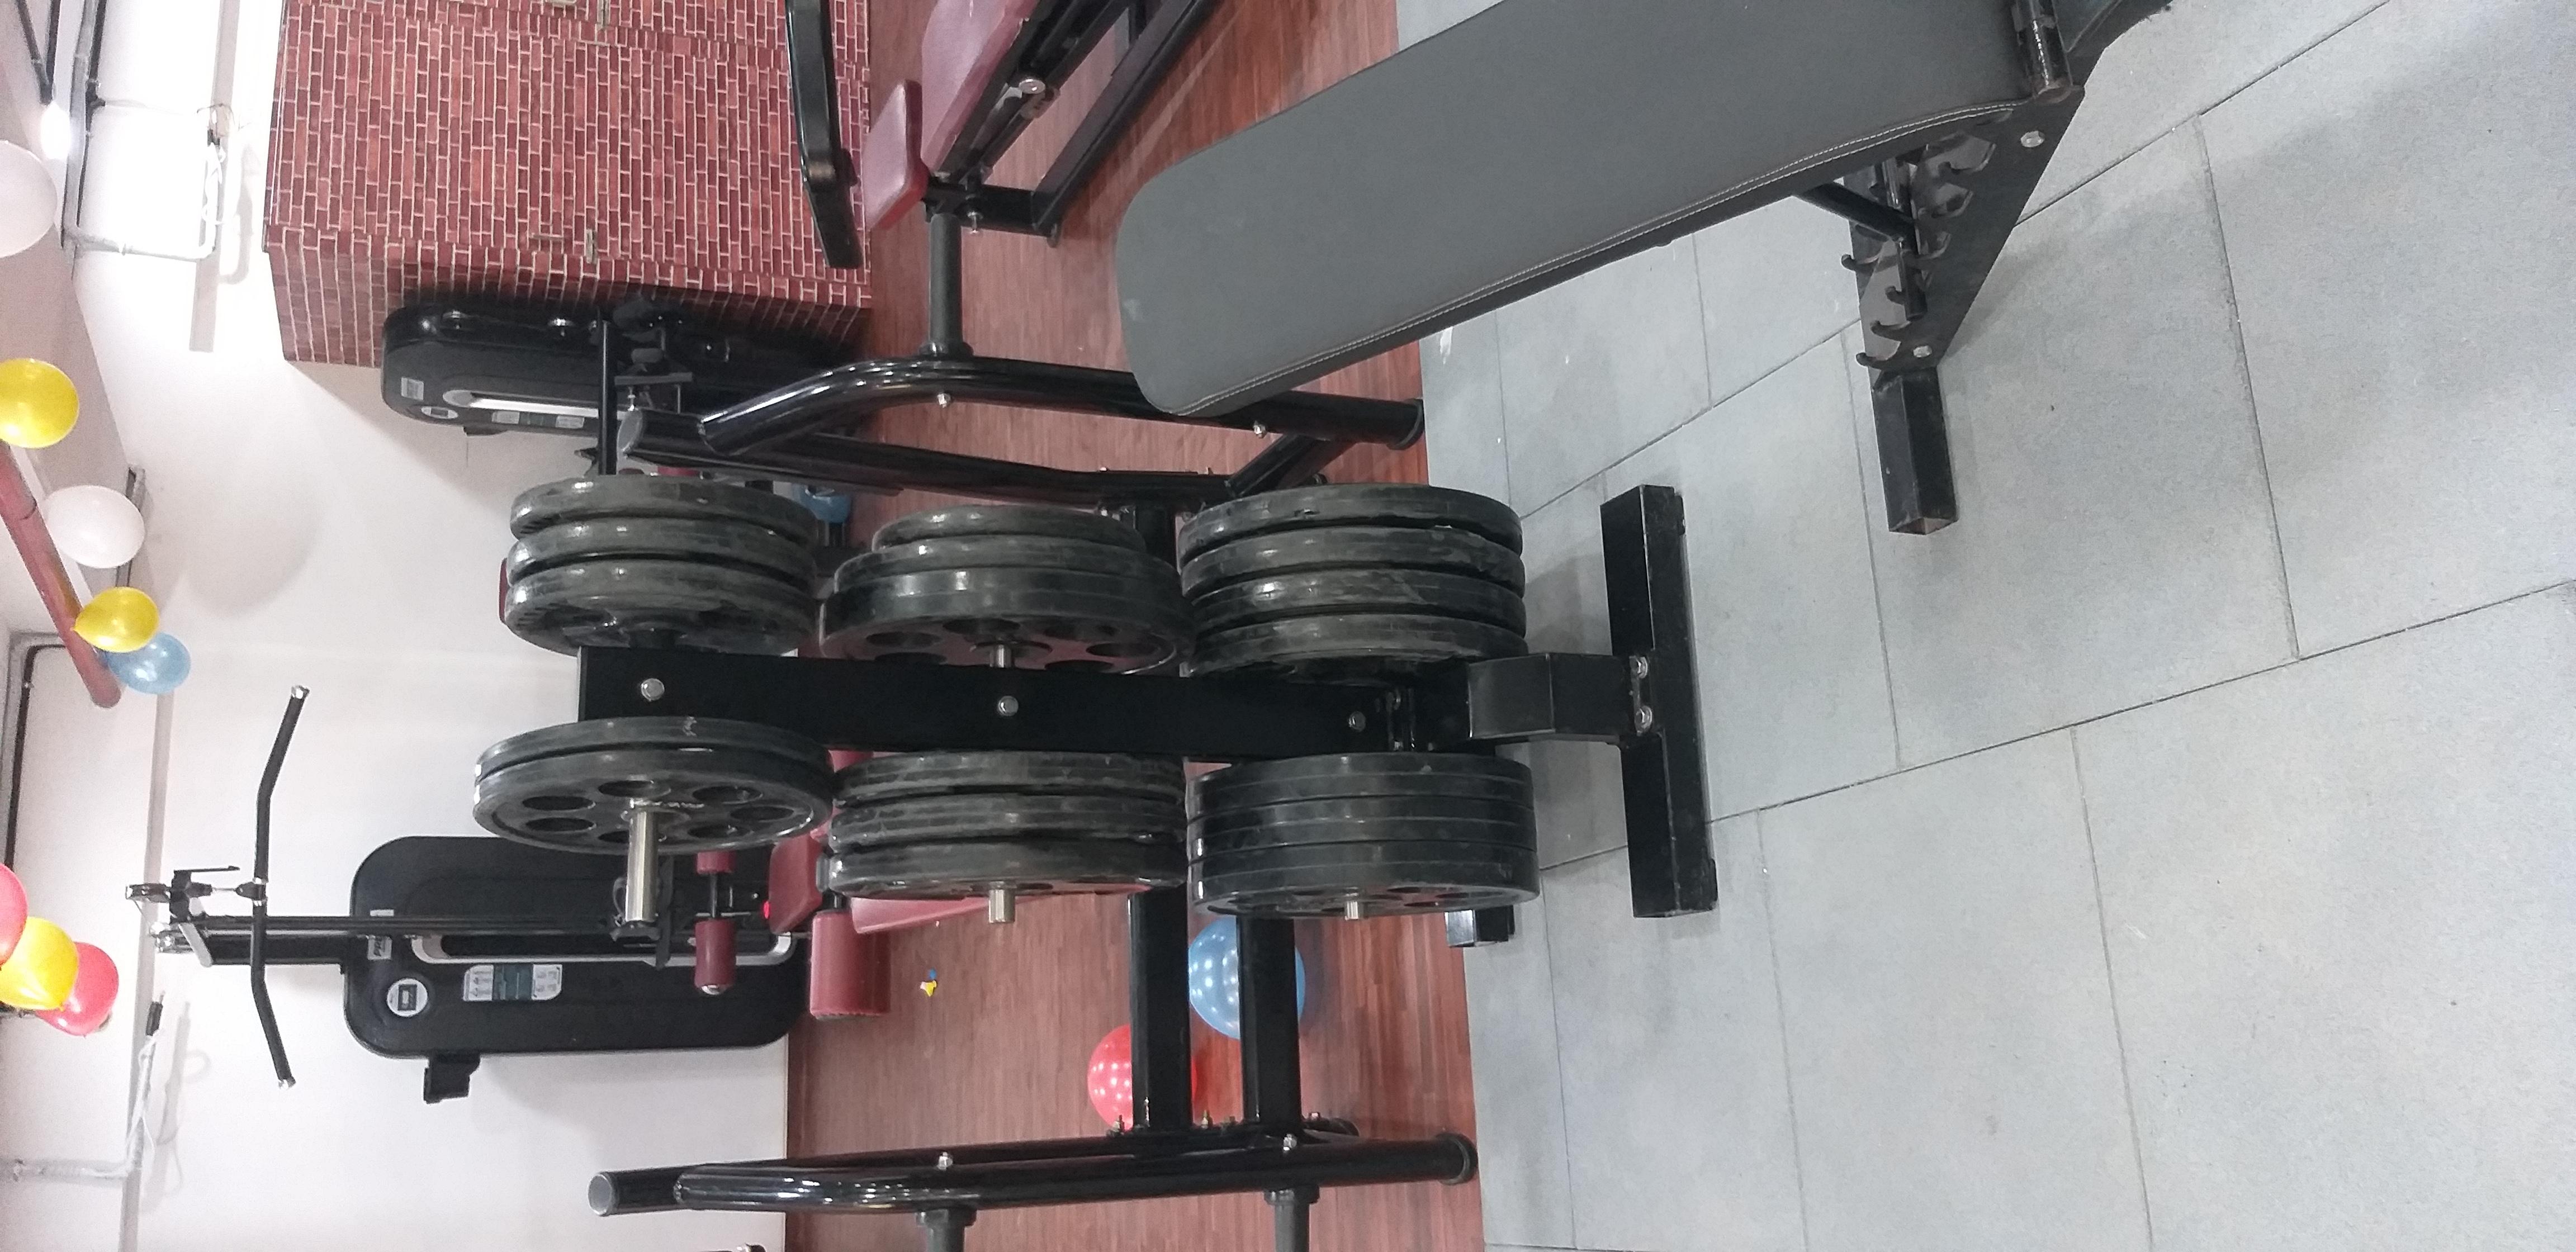 The Big Shot Gym Navrangpura